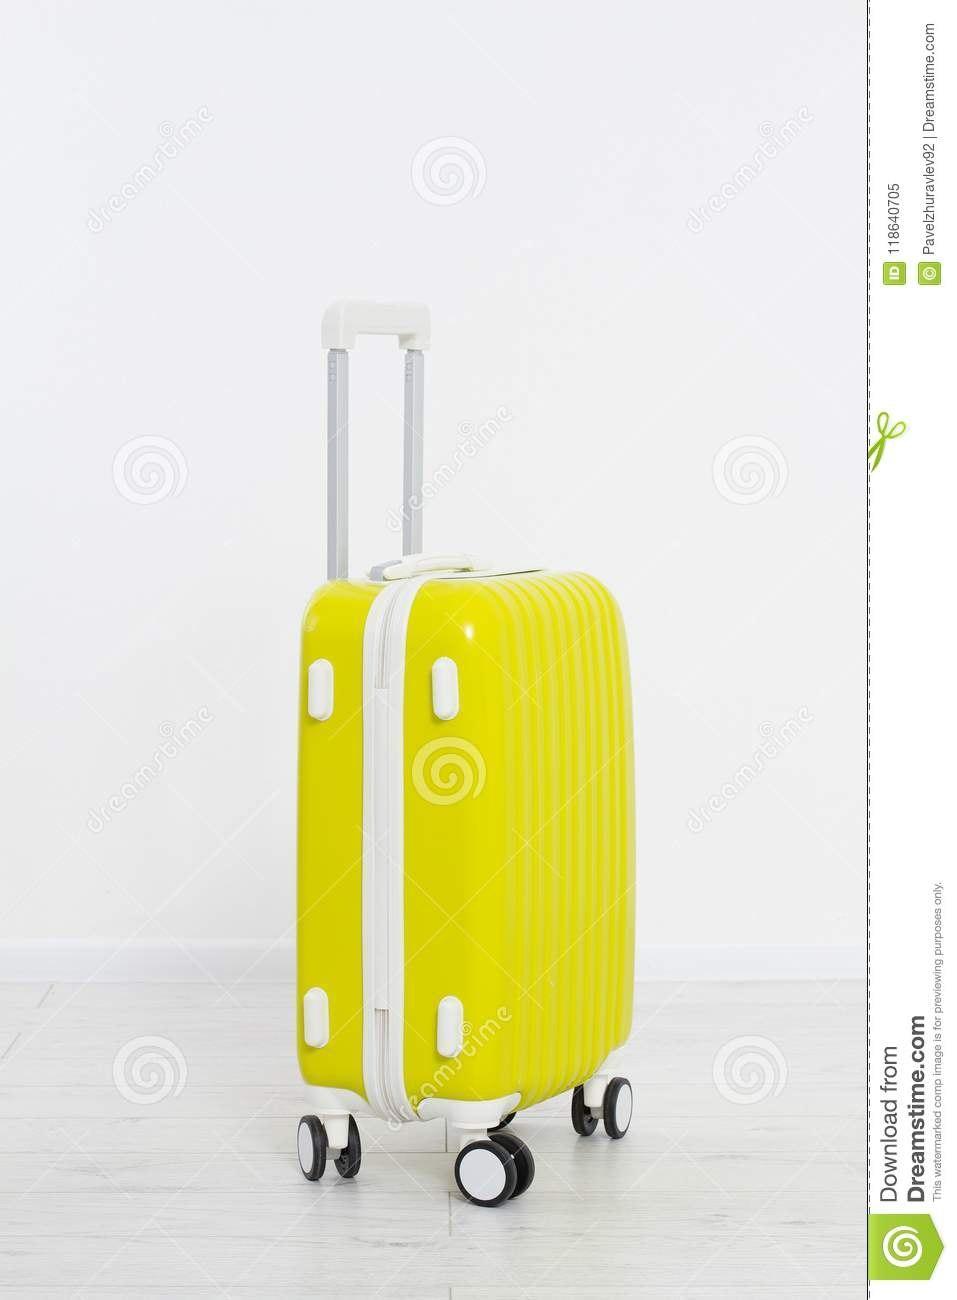 Yellow Suitcase On White Background Summer Holidays Travel Valise Within Blank Suitcase Template